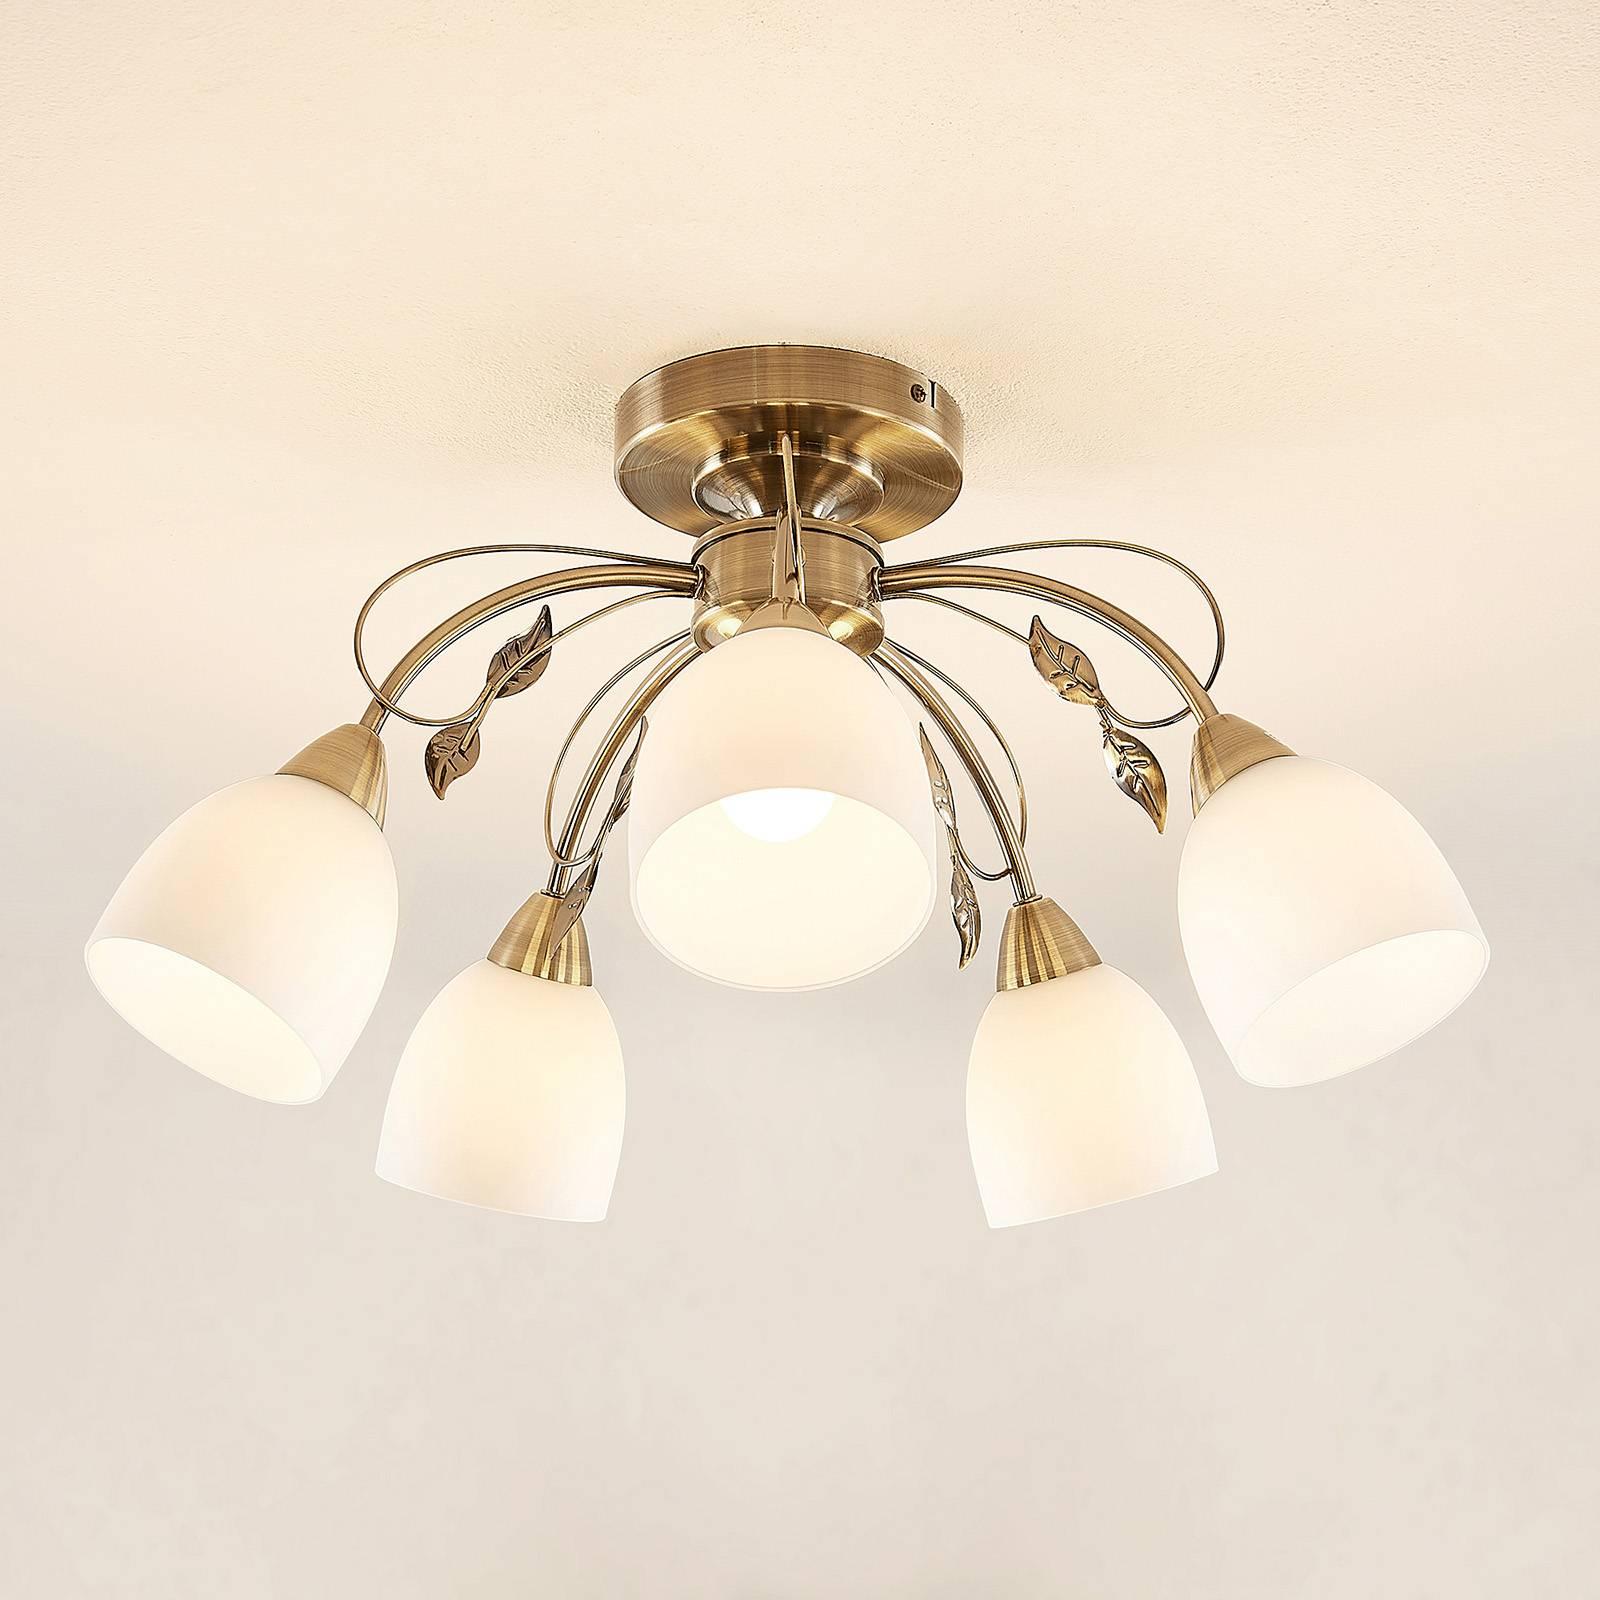 Lindby Thaddeus plafondlamp, 5-lamps, hoogte 31 cm